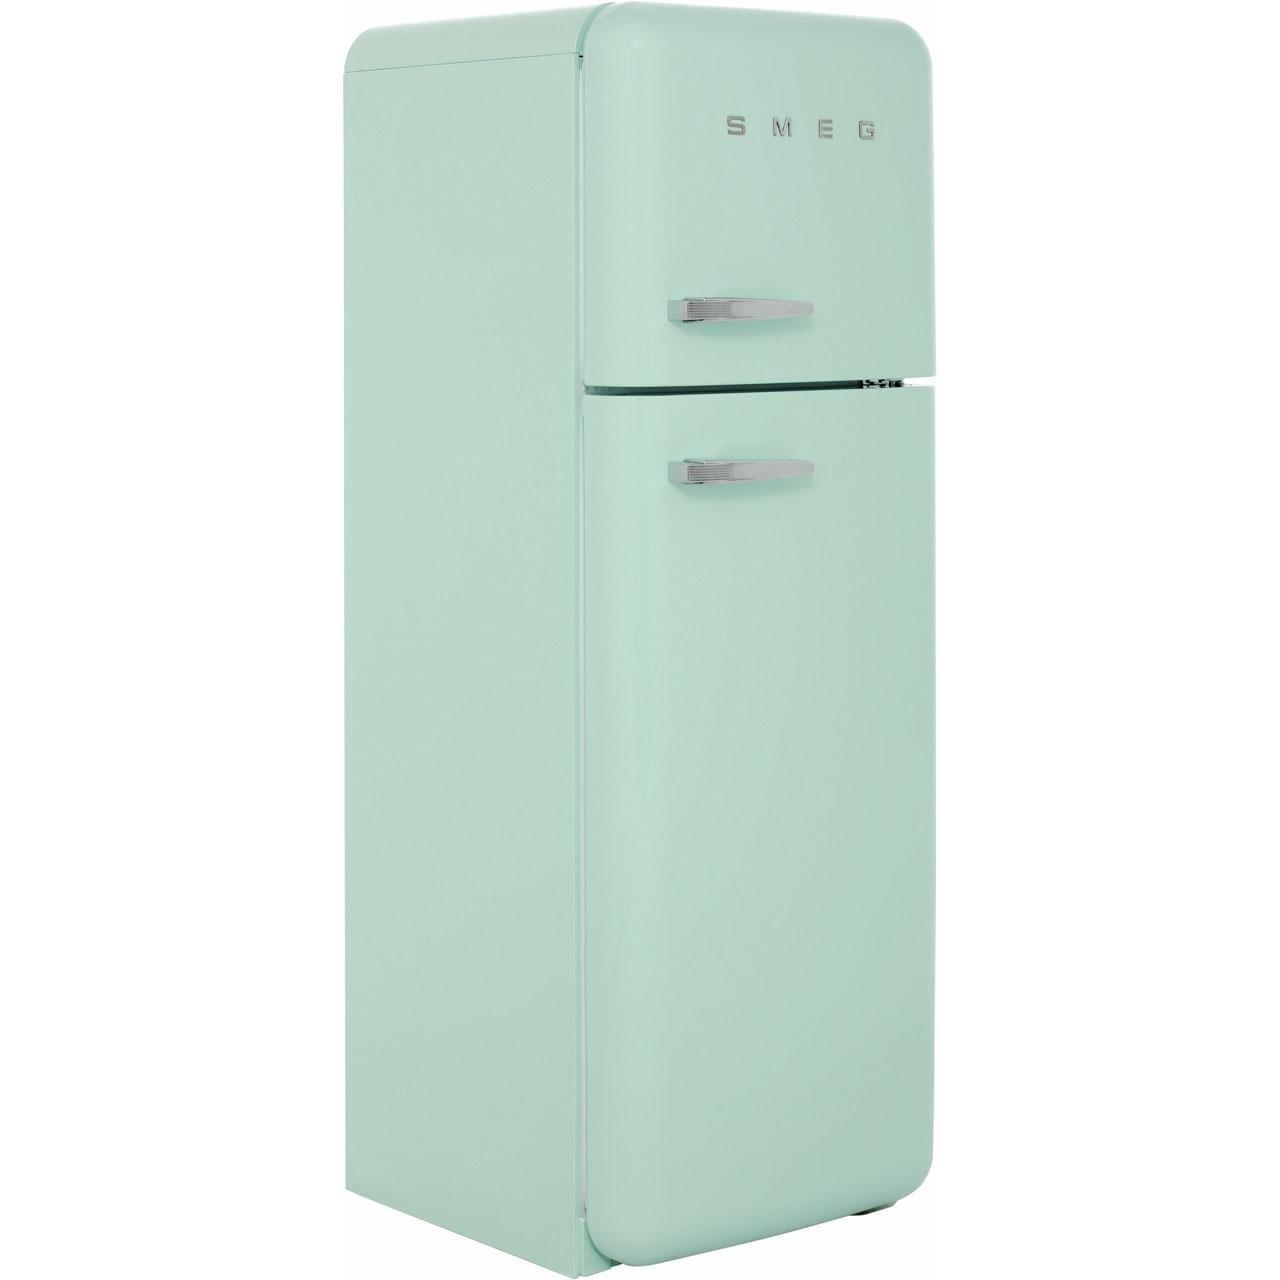 smeg fridge freezer shop for cheap fridge freezers and save online. Black Bedroom Furniture Sets. Home Design Ideas